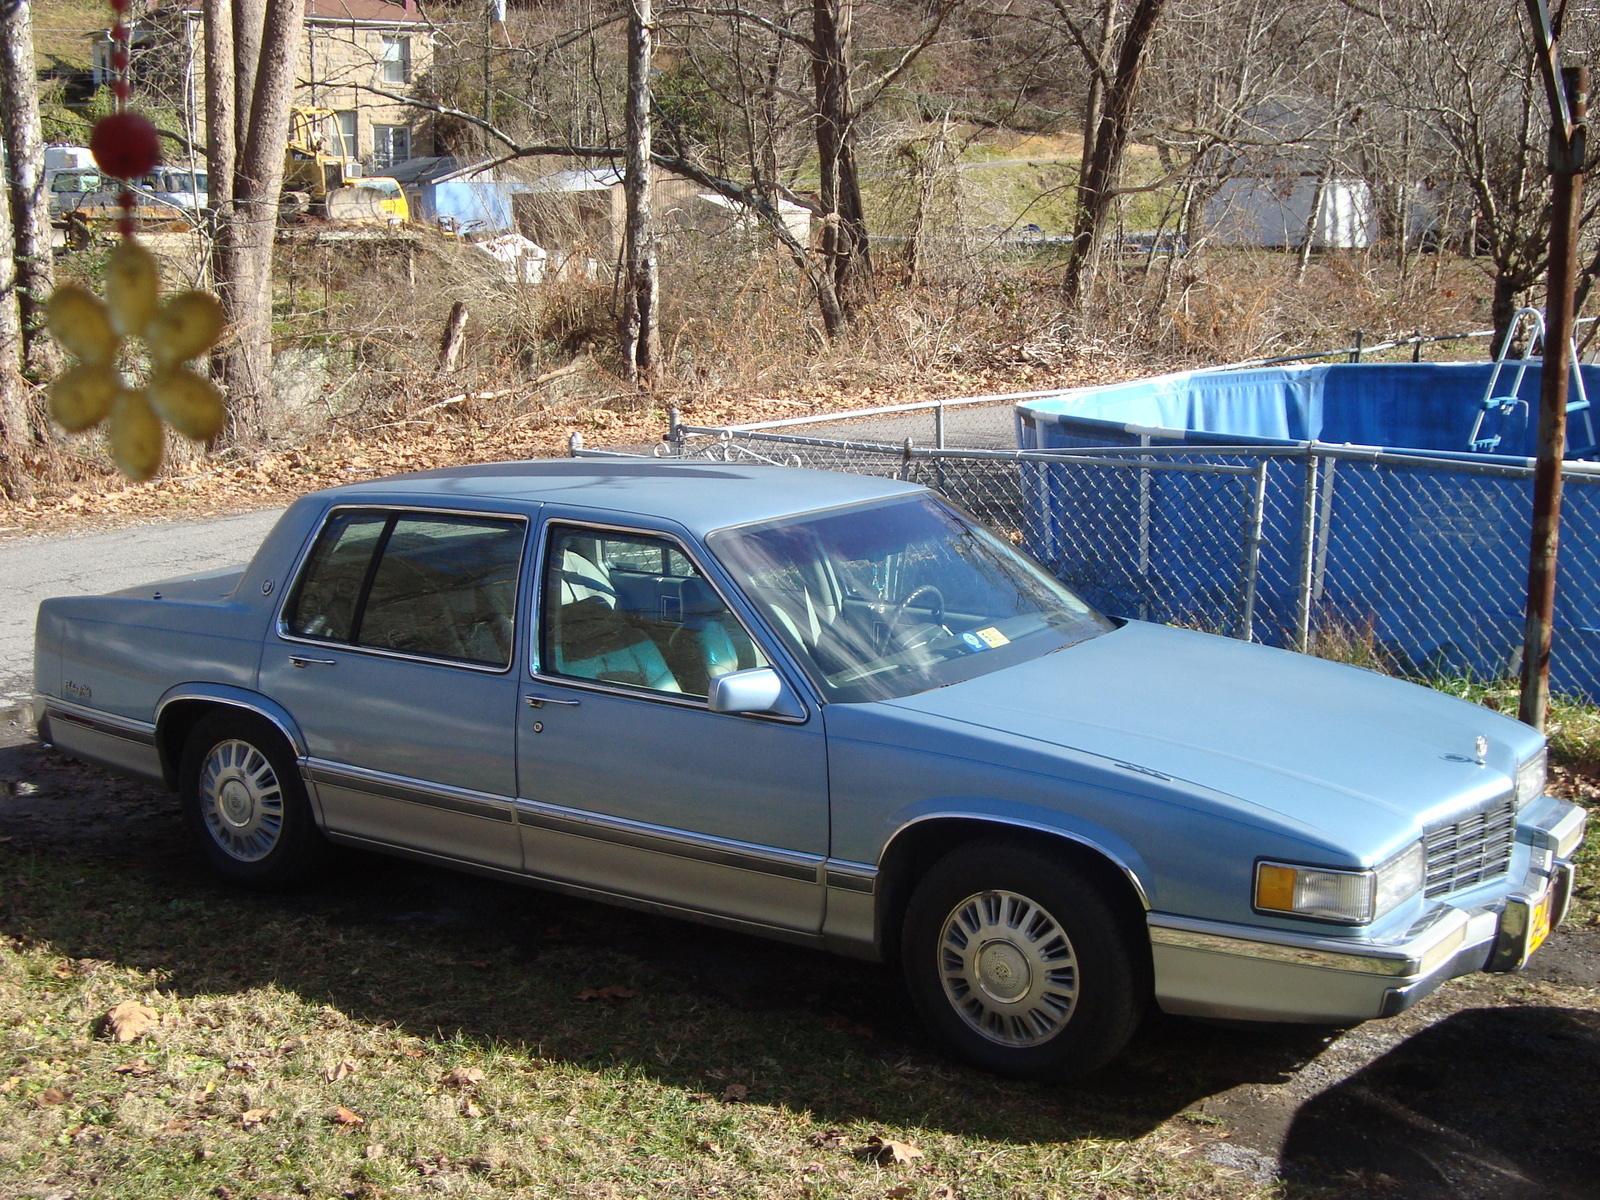 Cadillac DeVille Questions - my 93 deville has began